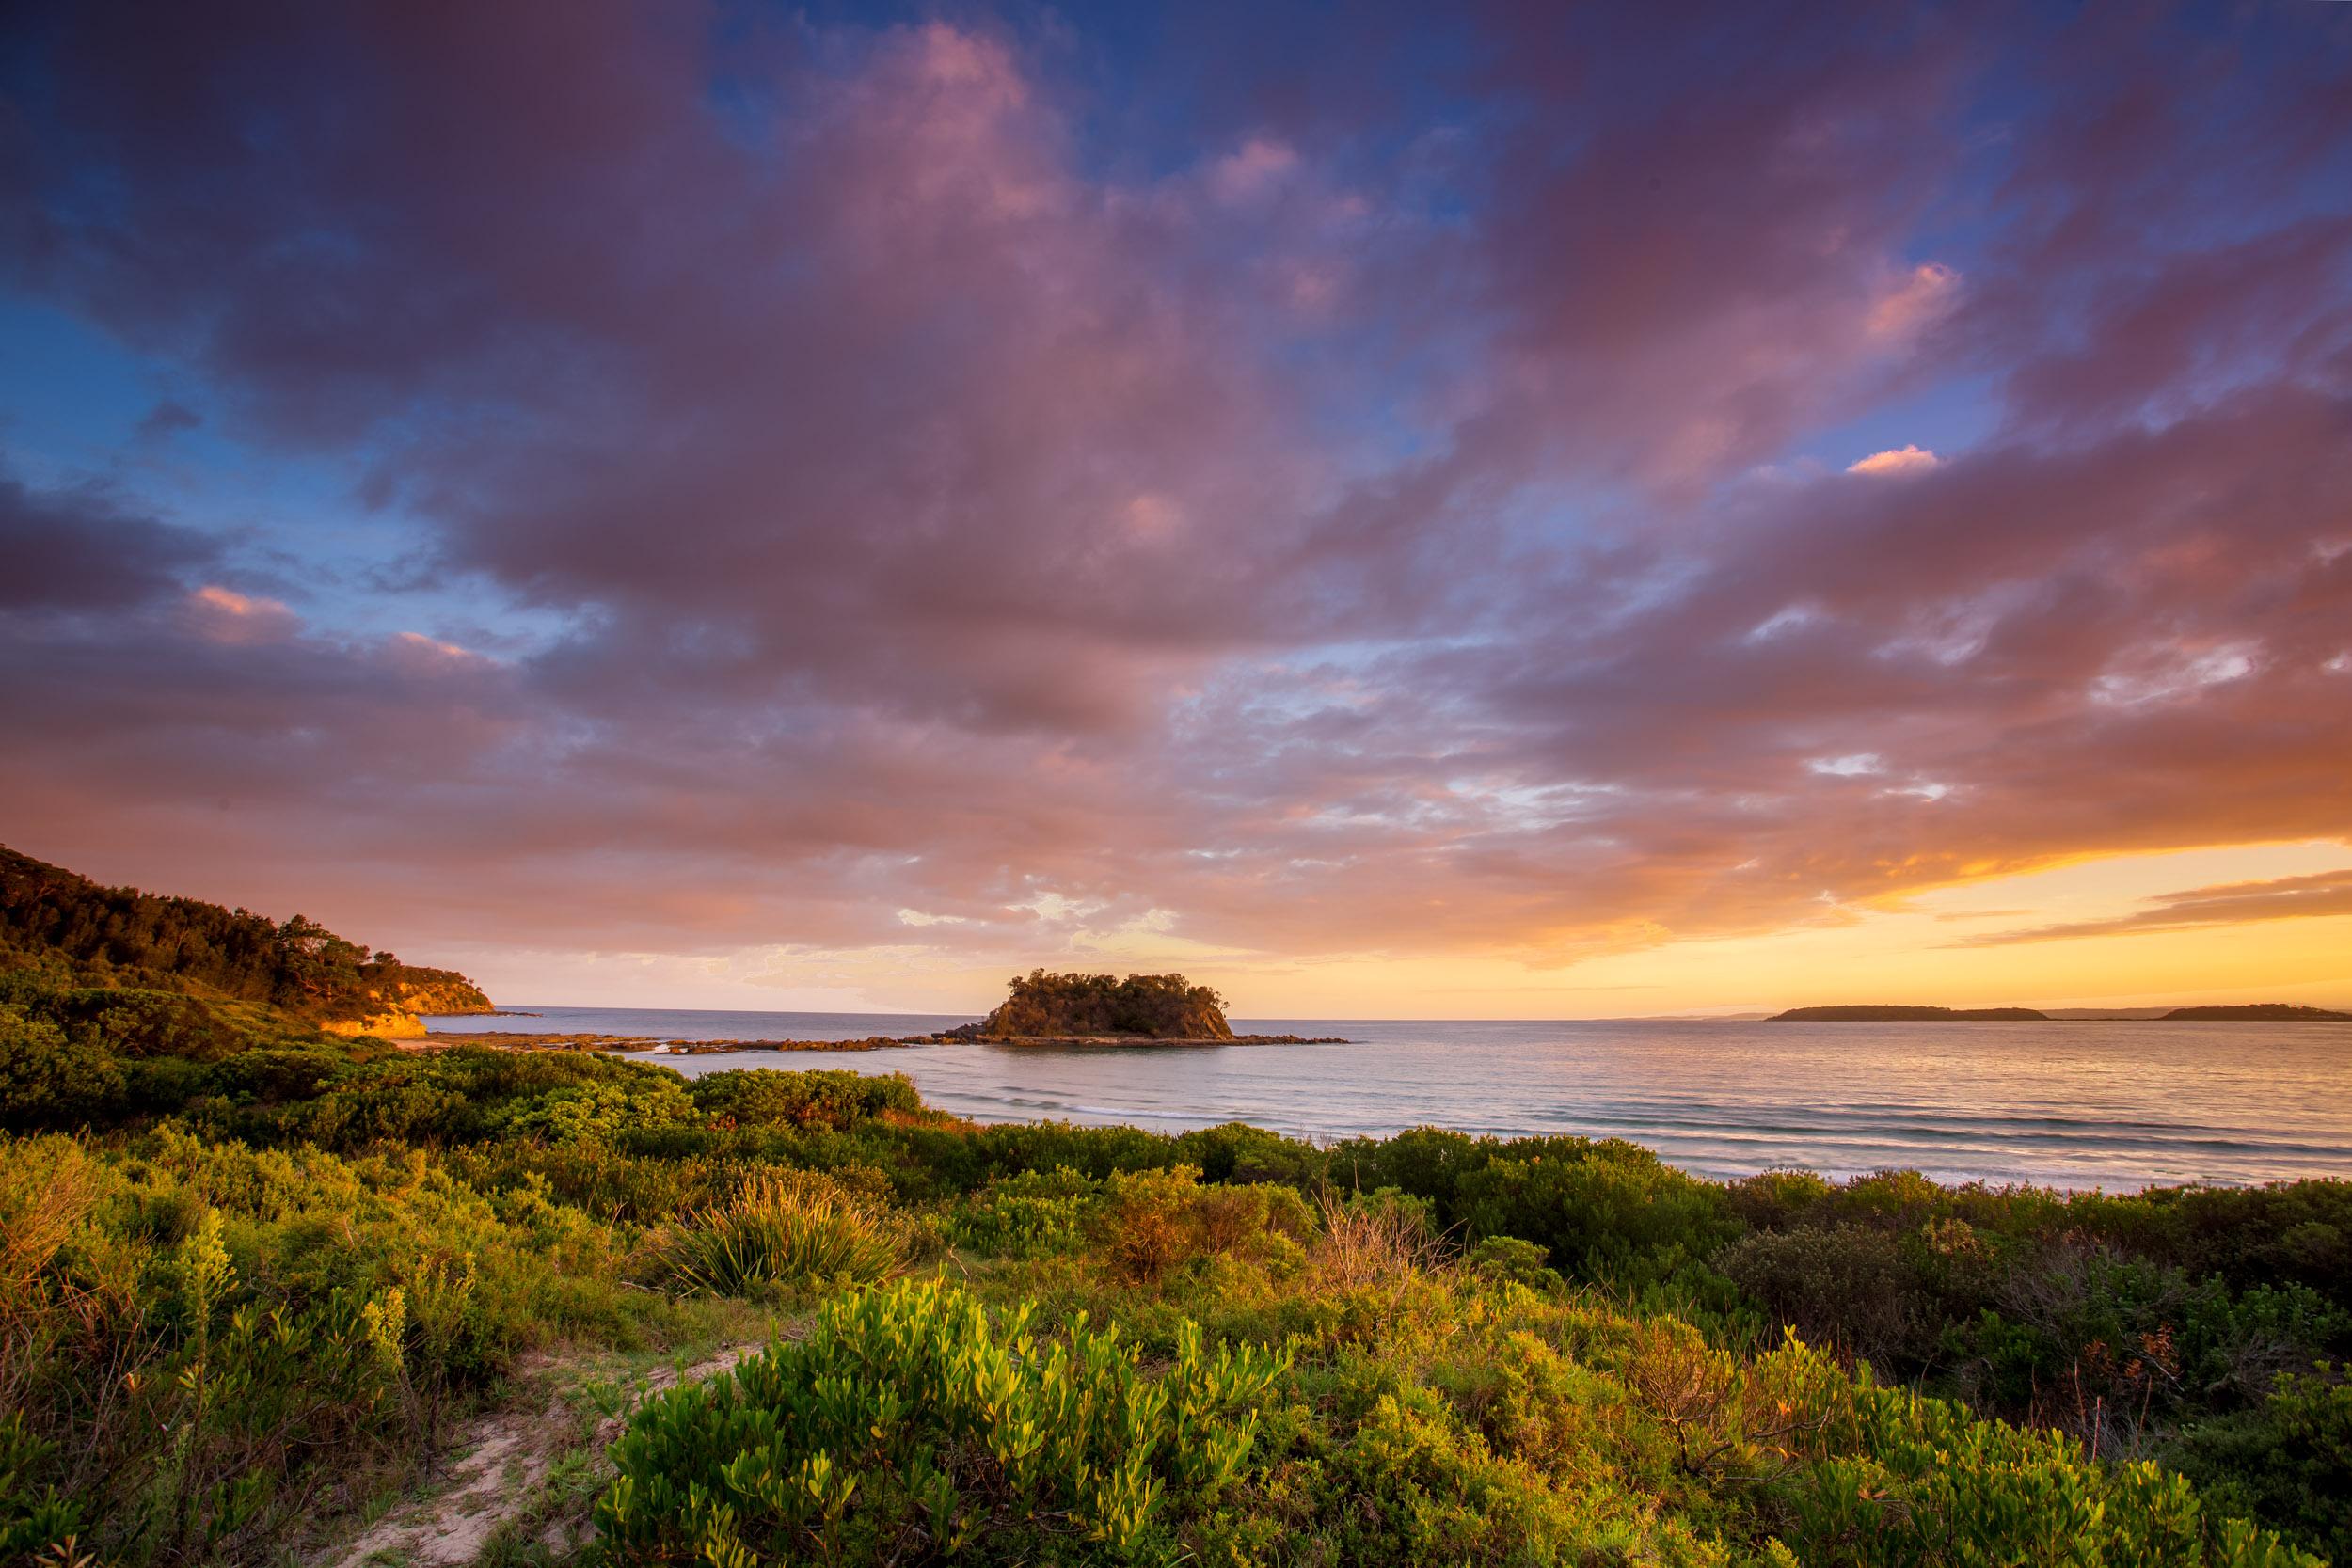 barlings-beach-landscape-photo-nsw.jpg